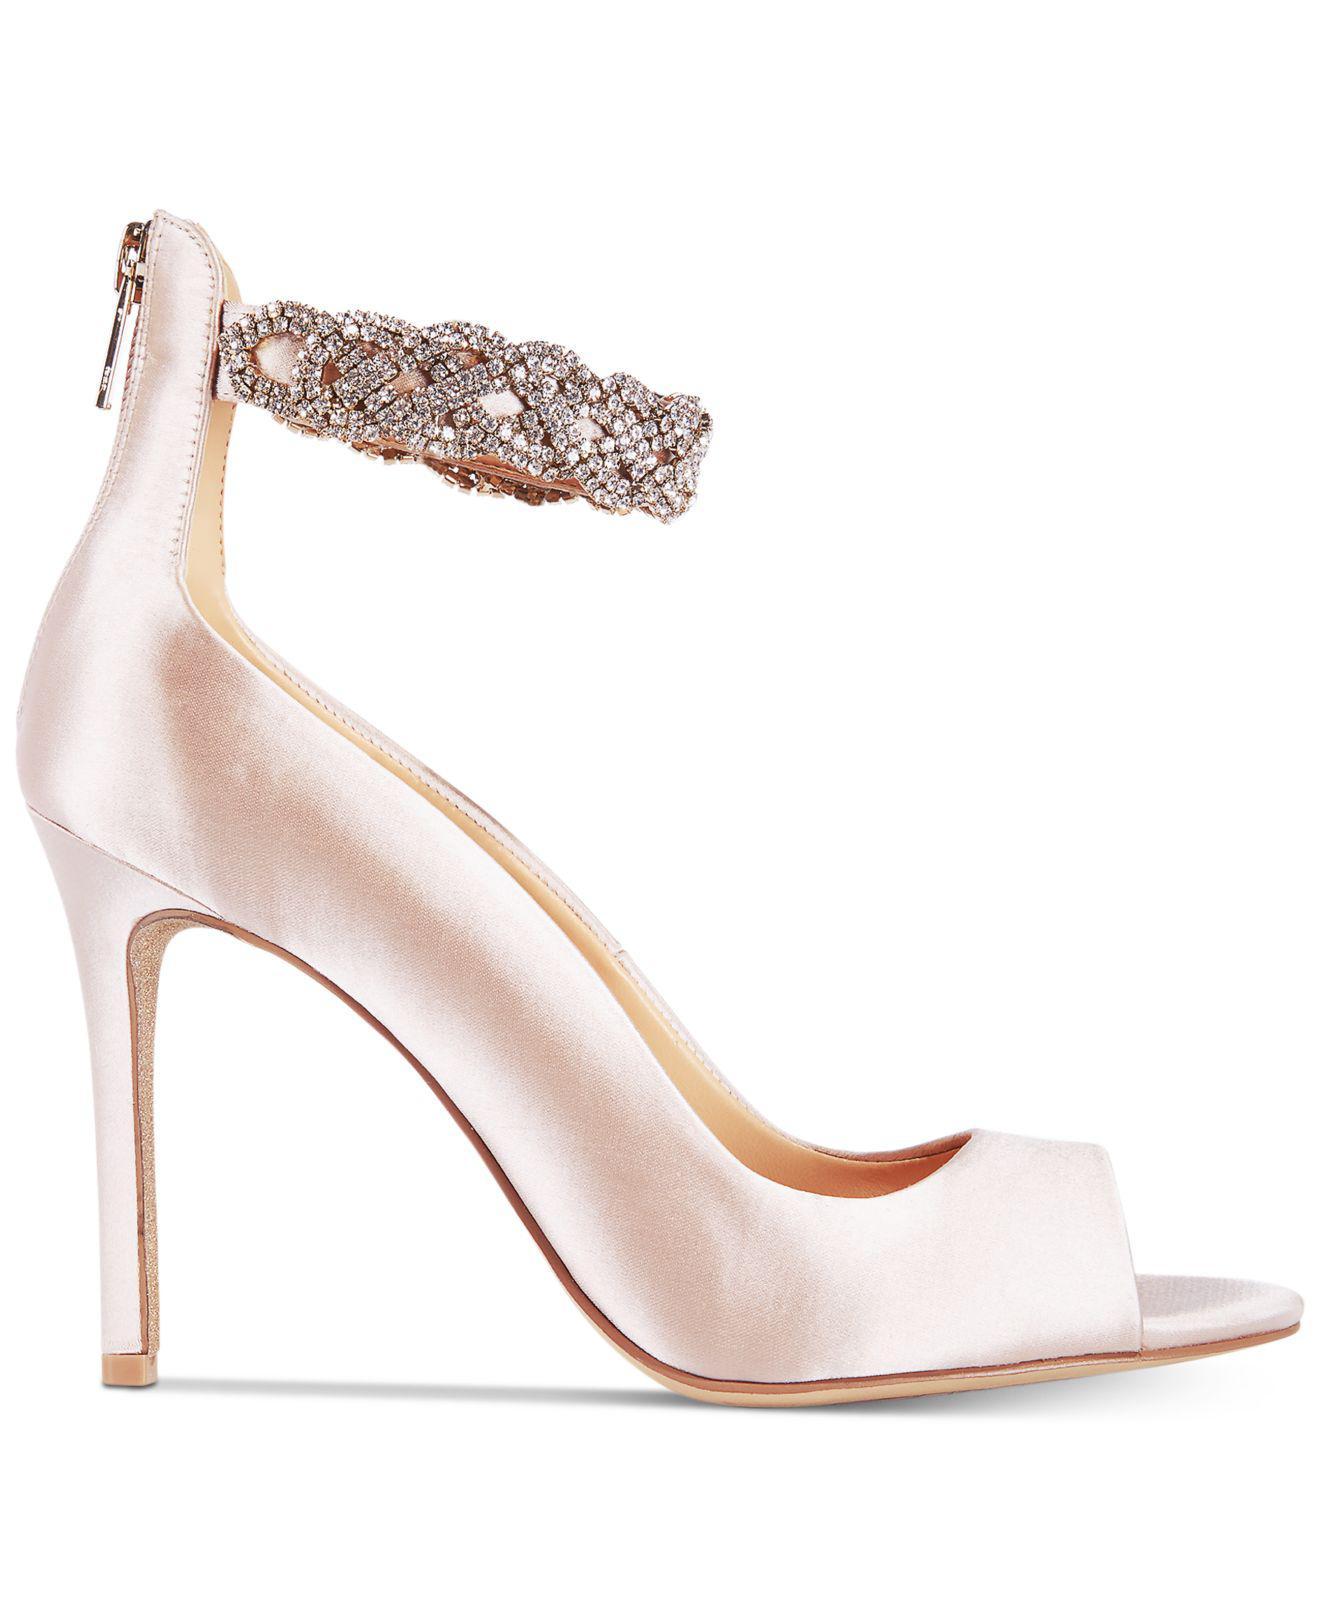 af736aabcc8 Badgley Mischka Alanis Shoes - Lyst